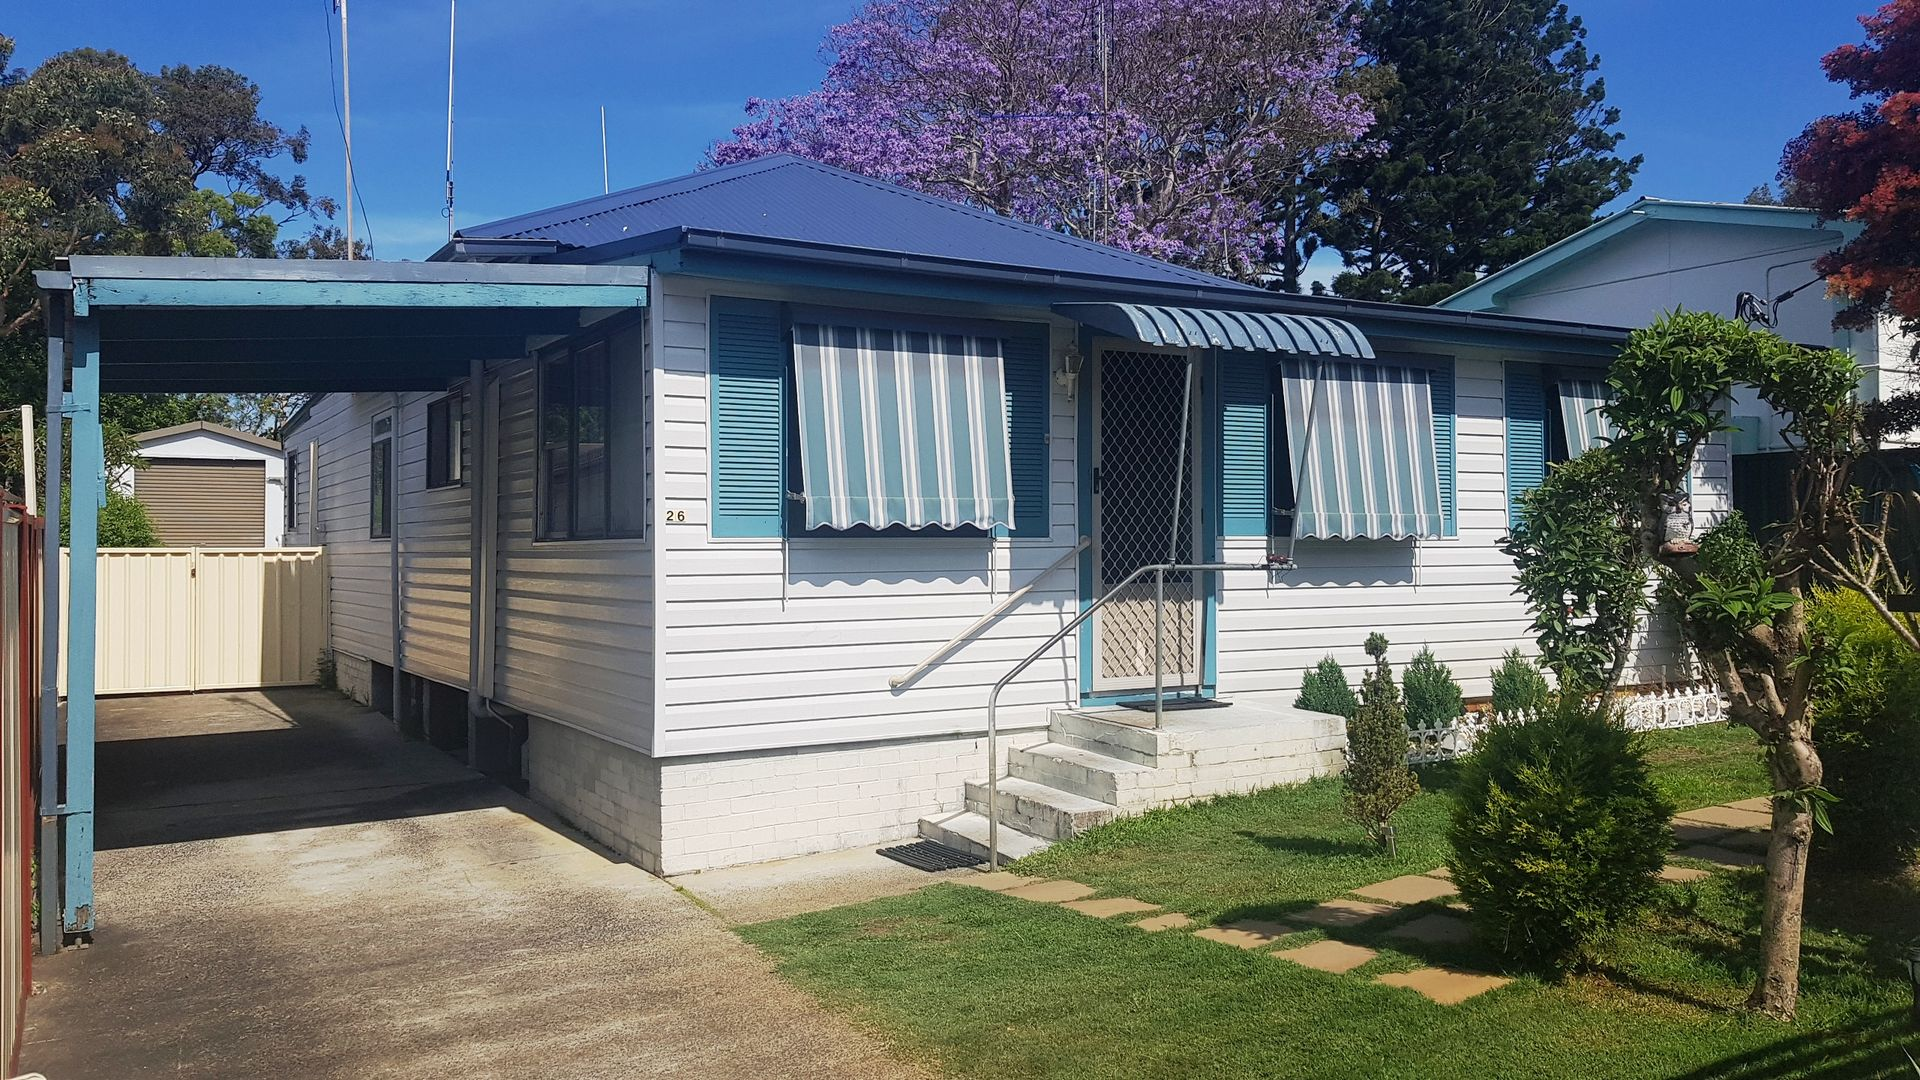 26 Welcome Street, Woy Woy NSW 2256, Image 1